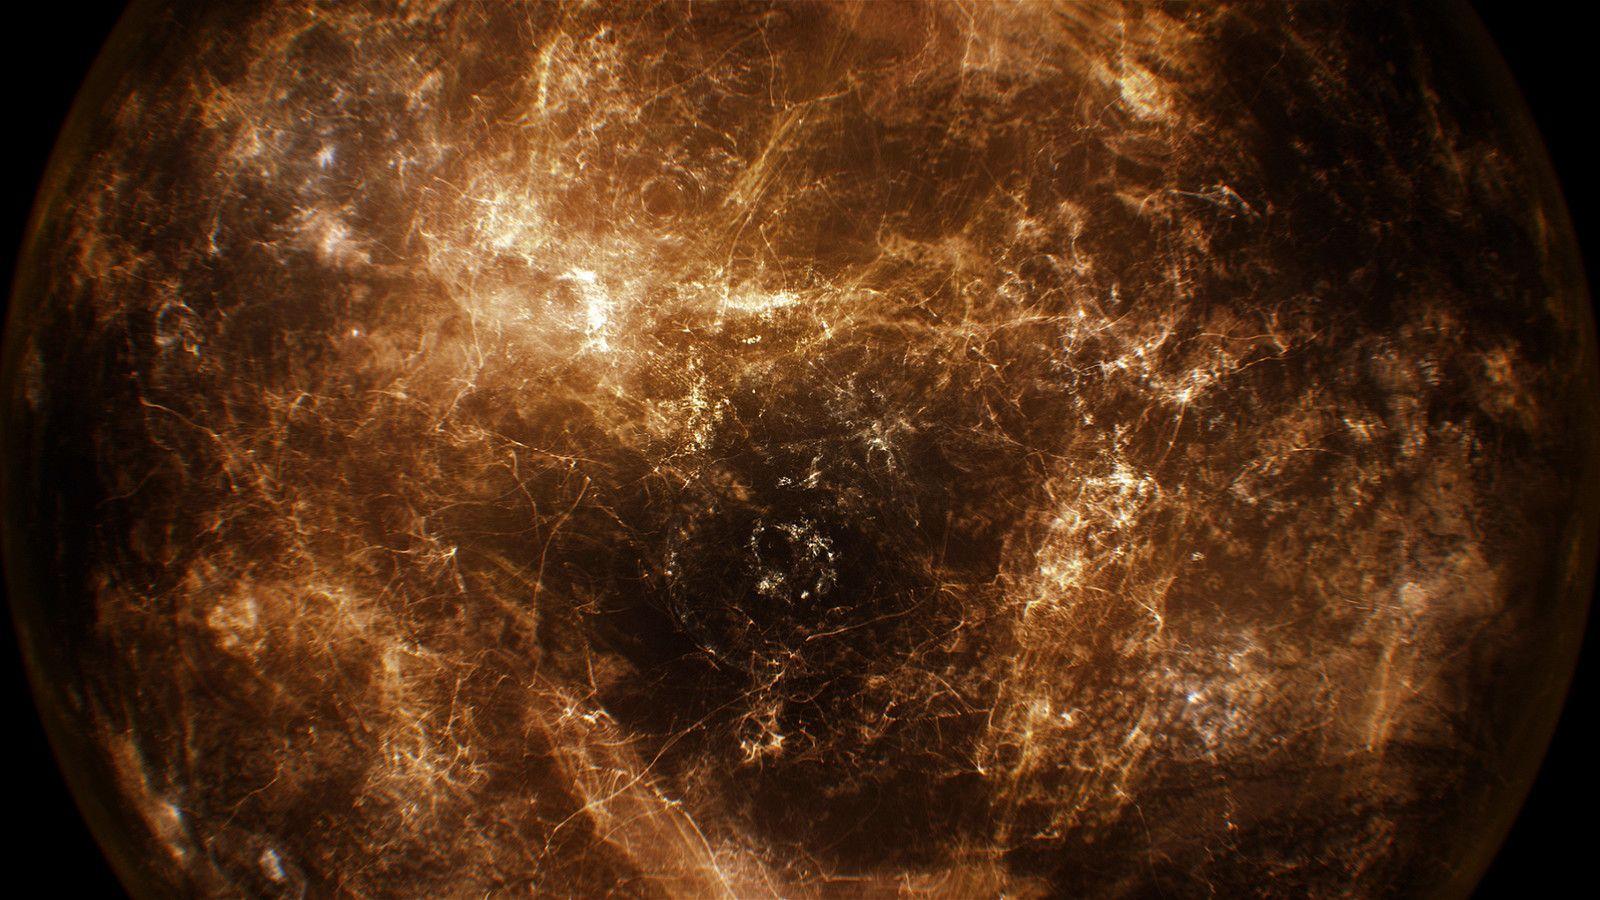 Planets-03 (Maya Dynamics Included), Arbi Babakhanians on ArtStation at https://www.artstation.com/artwork/X2Lzw